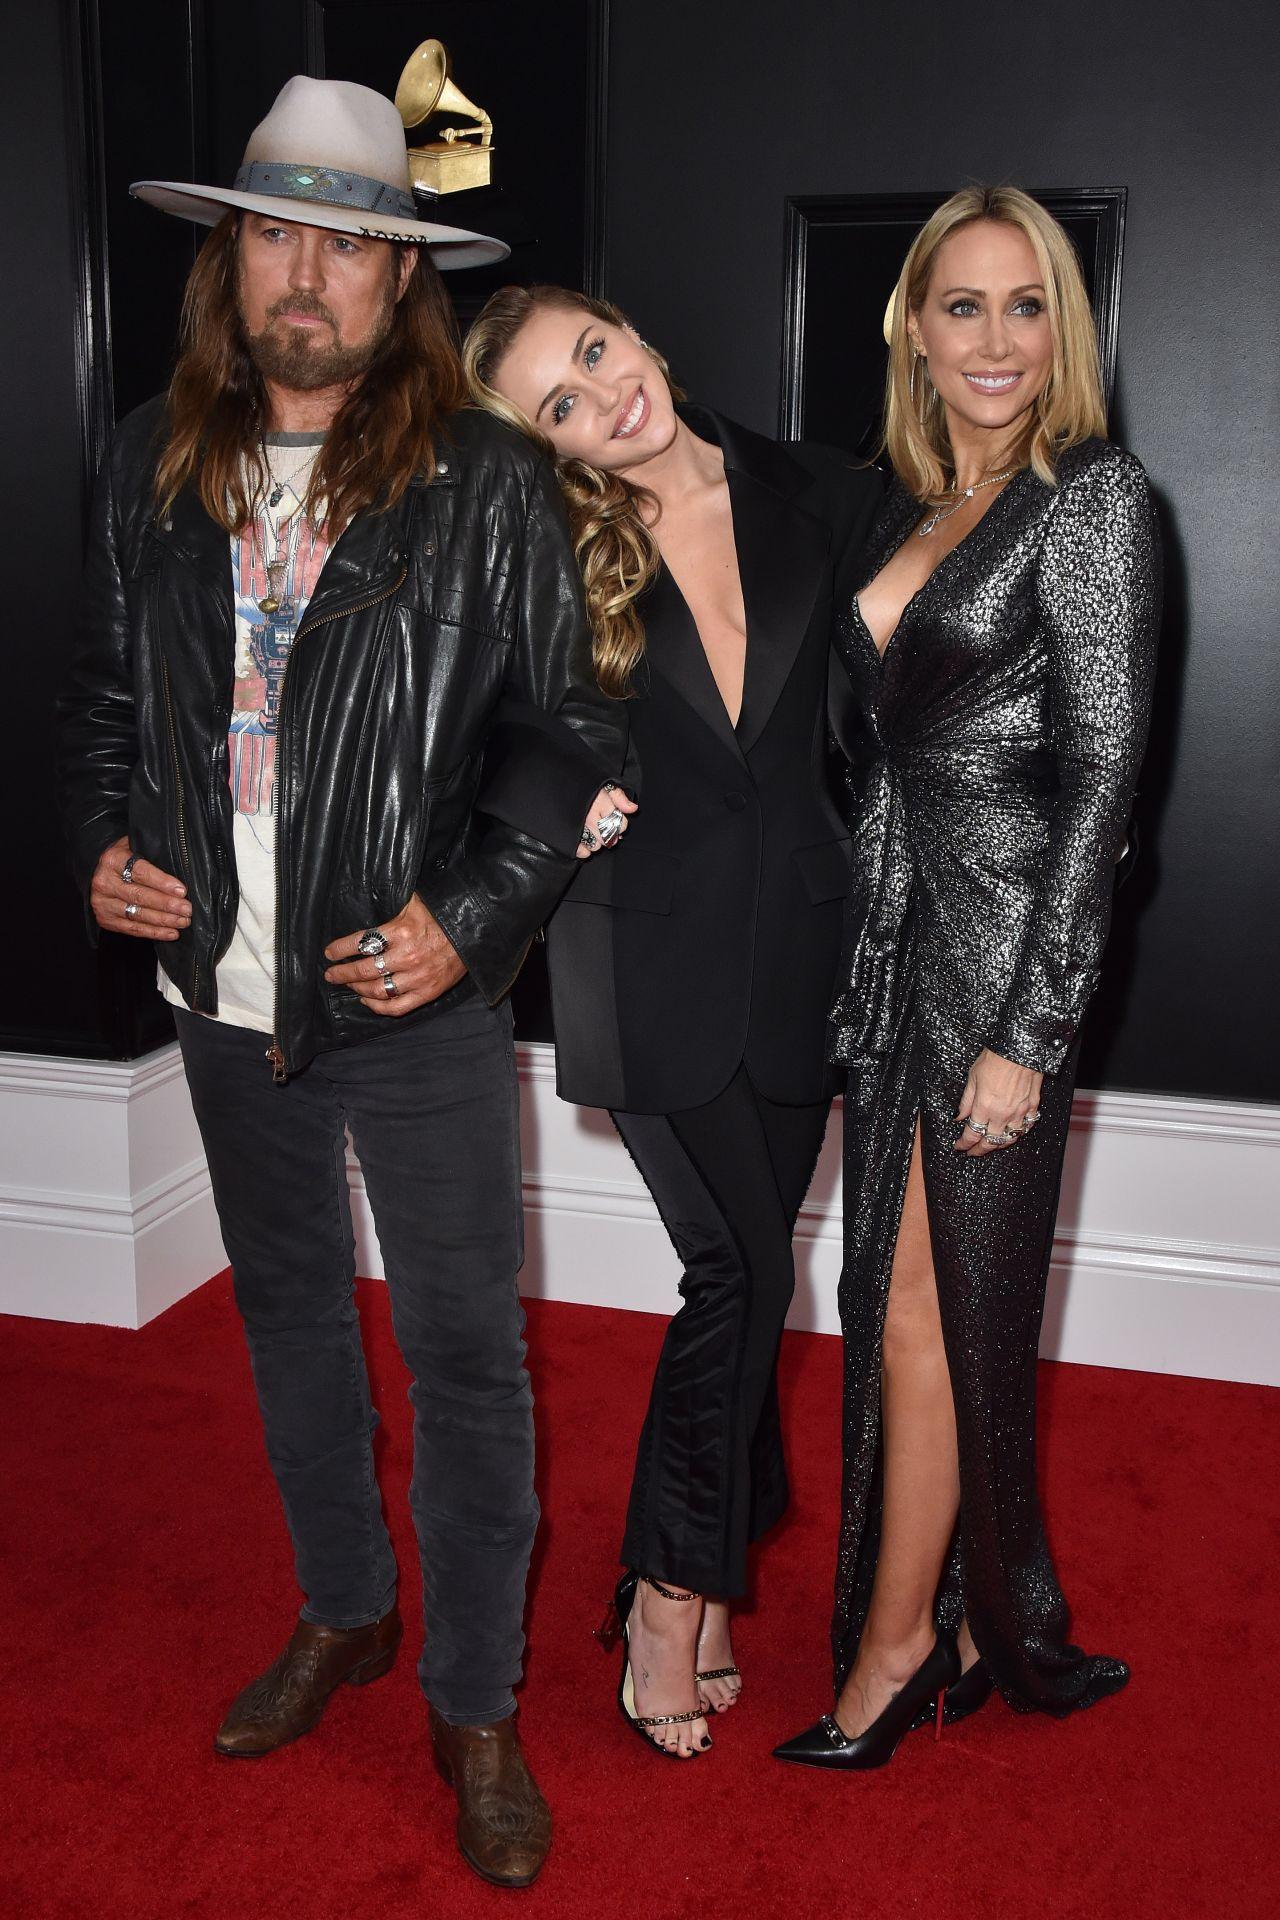 Miley Cyrus 2019 Grammy Awards